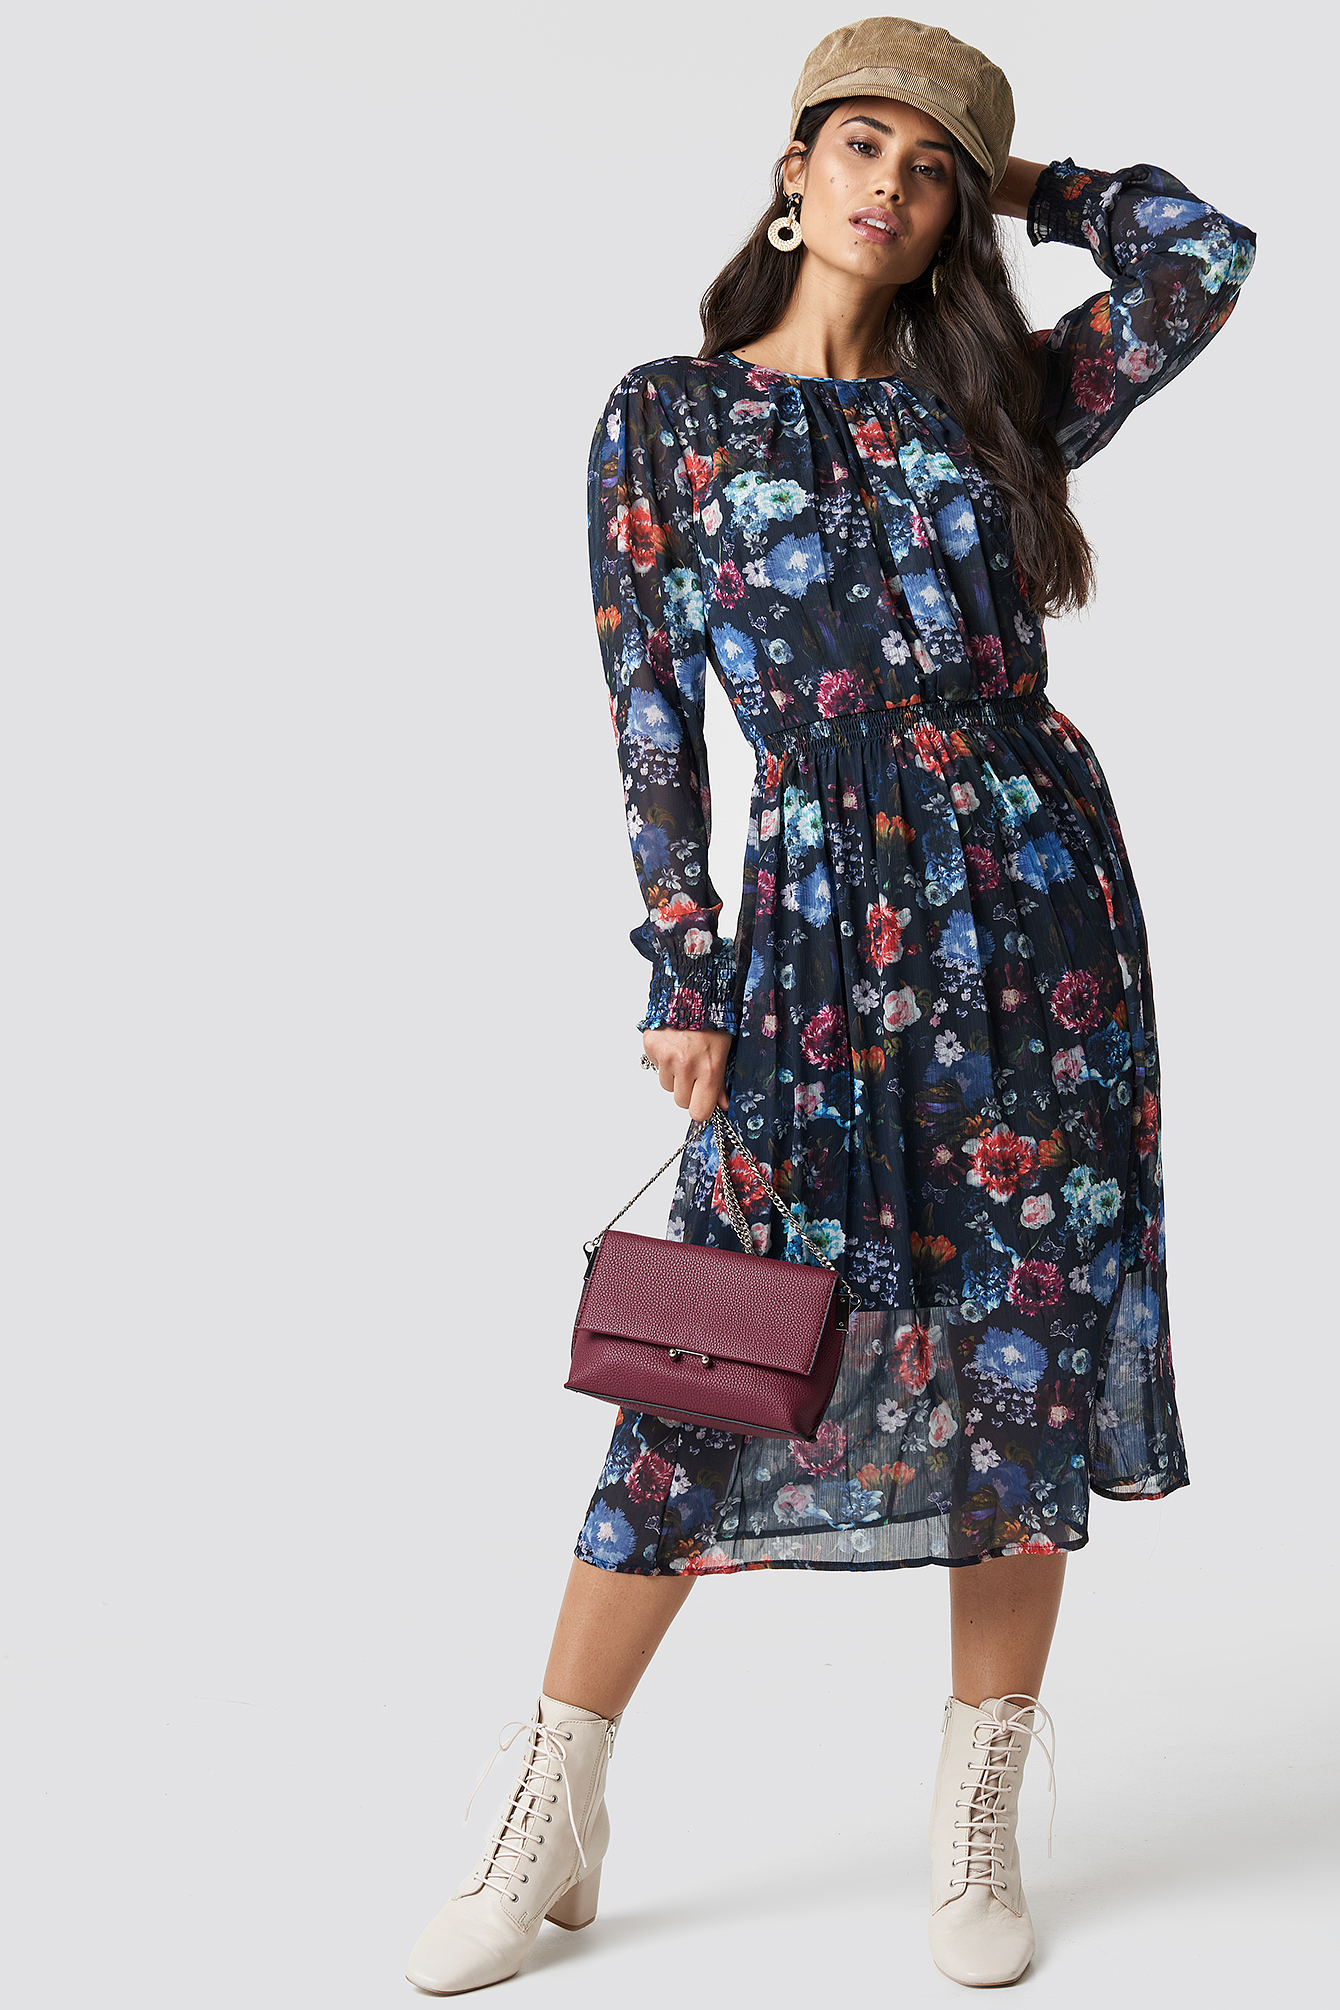 TOP SECRET Long Flower Dress - Multicolor, Navy in Multicolor,Navy